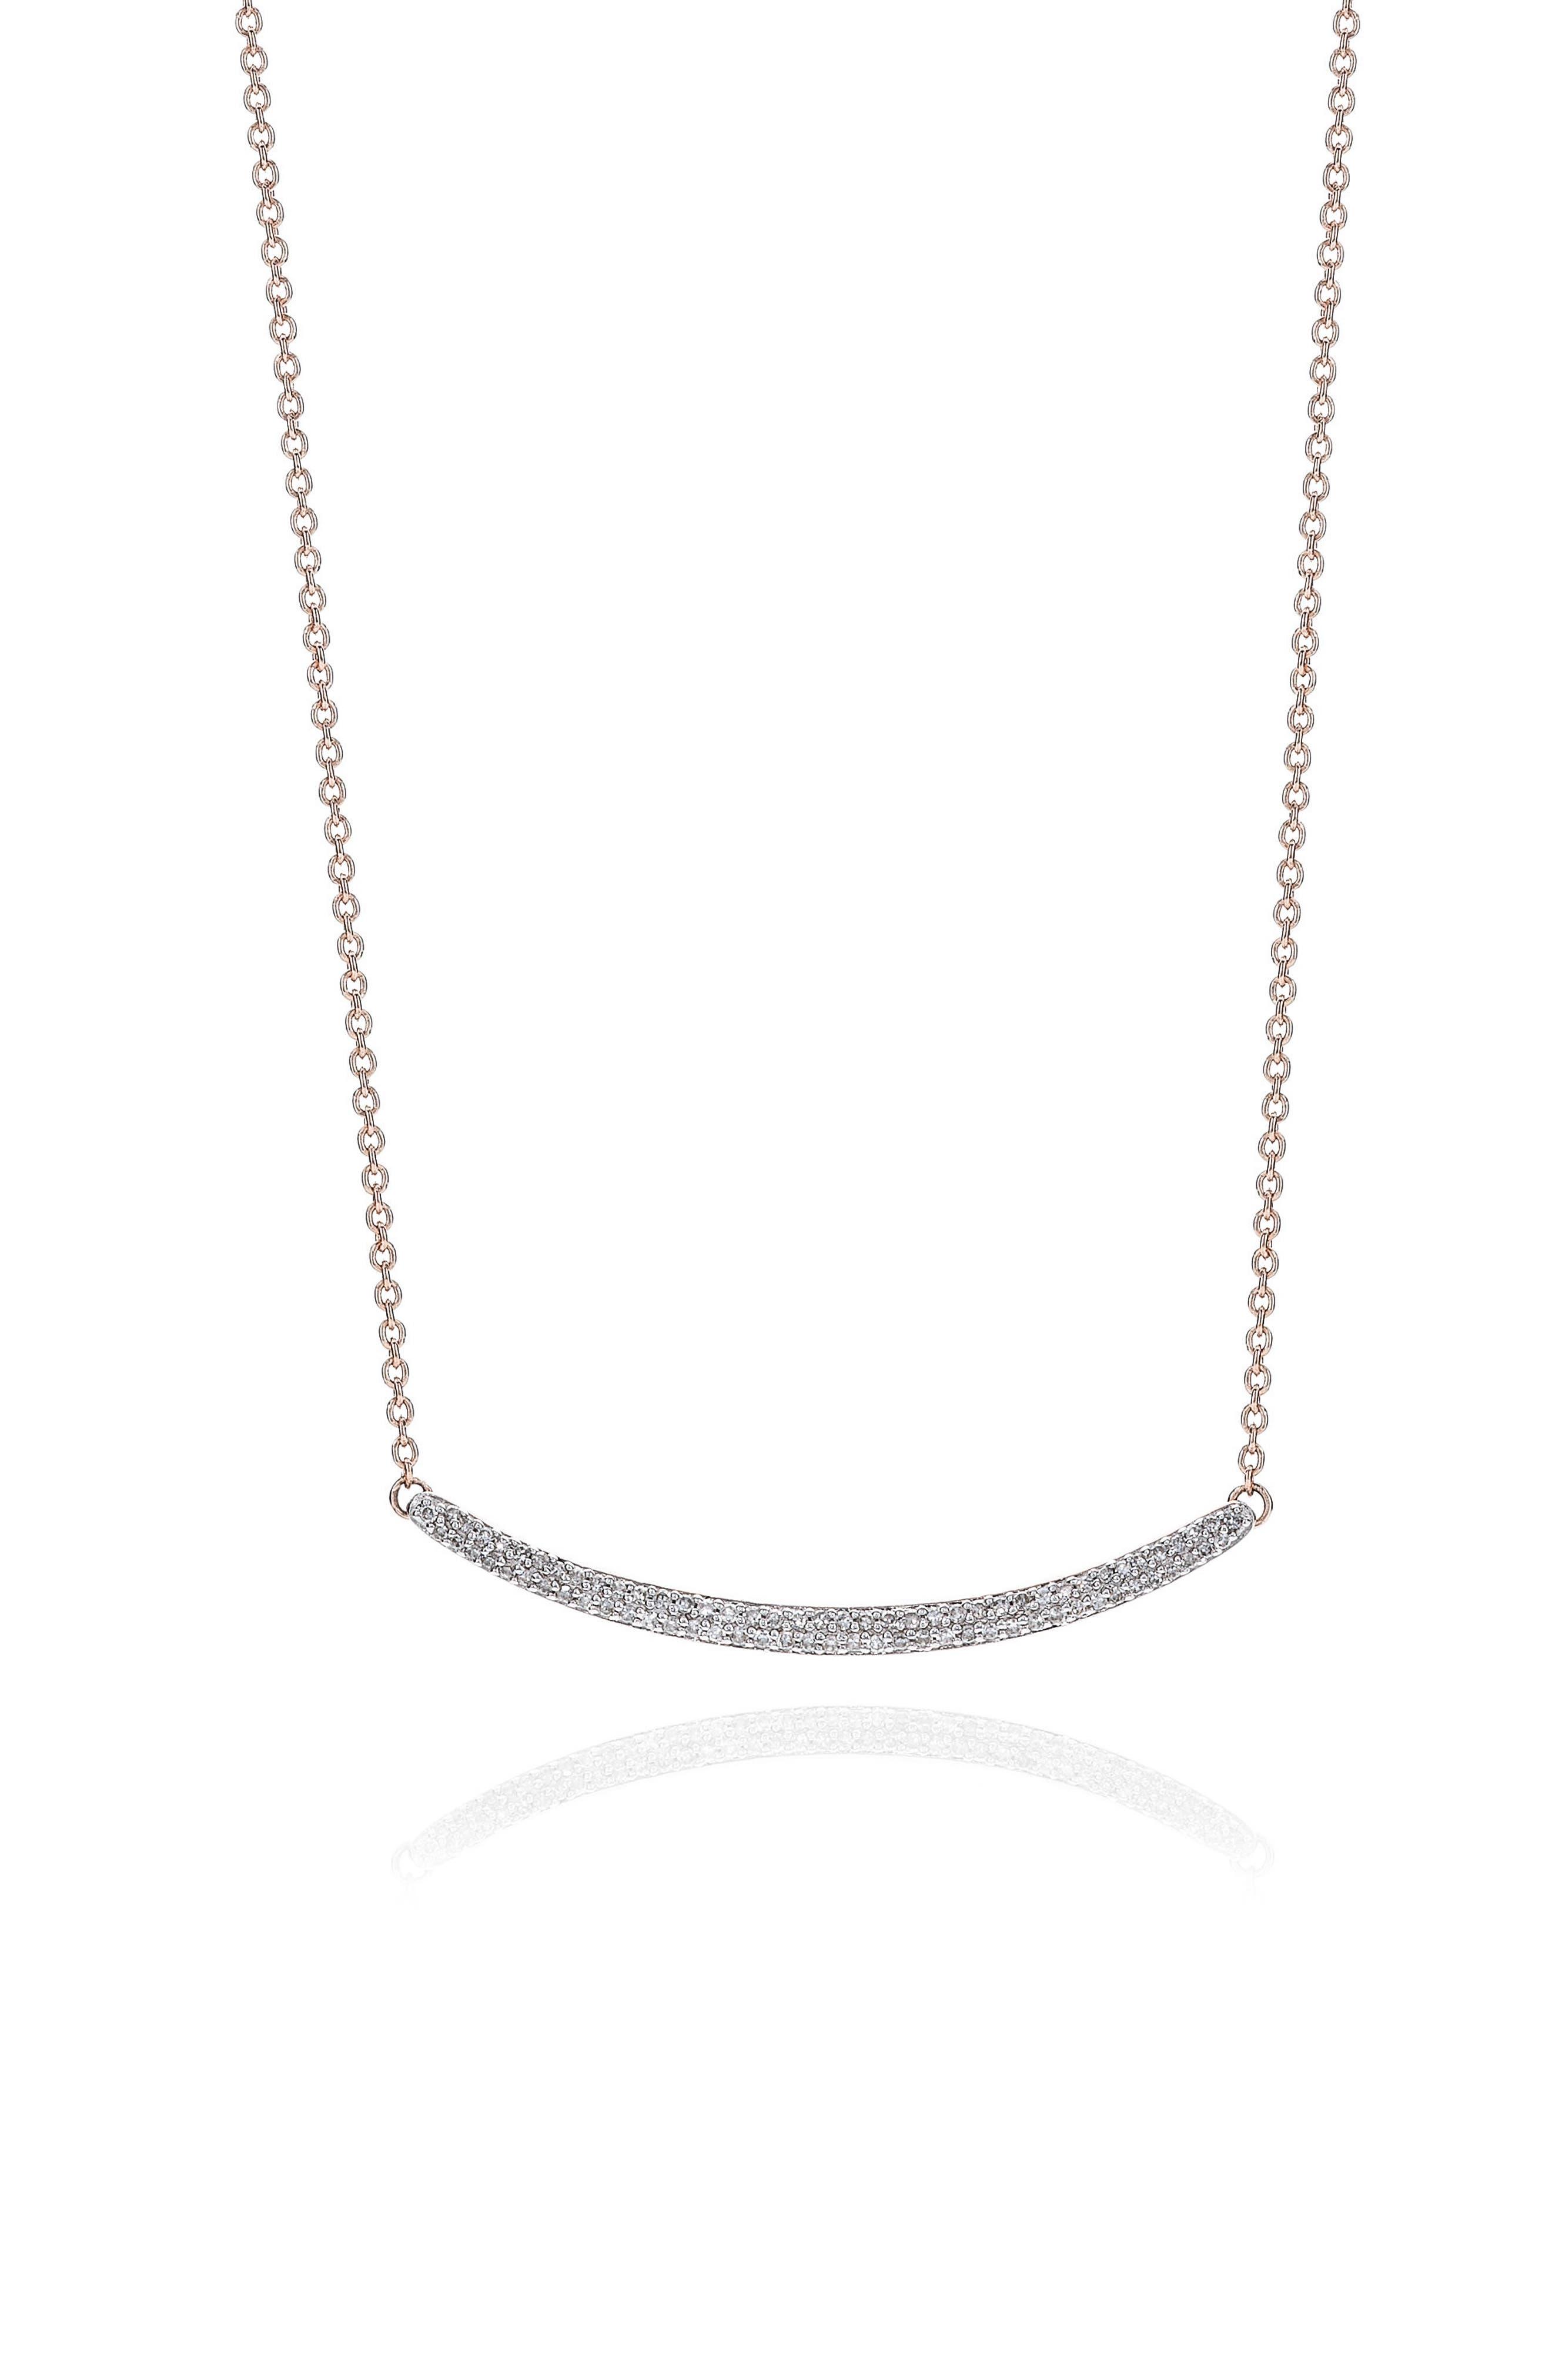 Monica Vinader Necklaces SKINNY DIAMOND NECKLACE